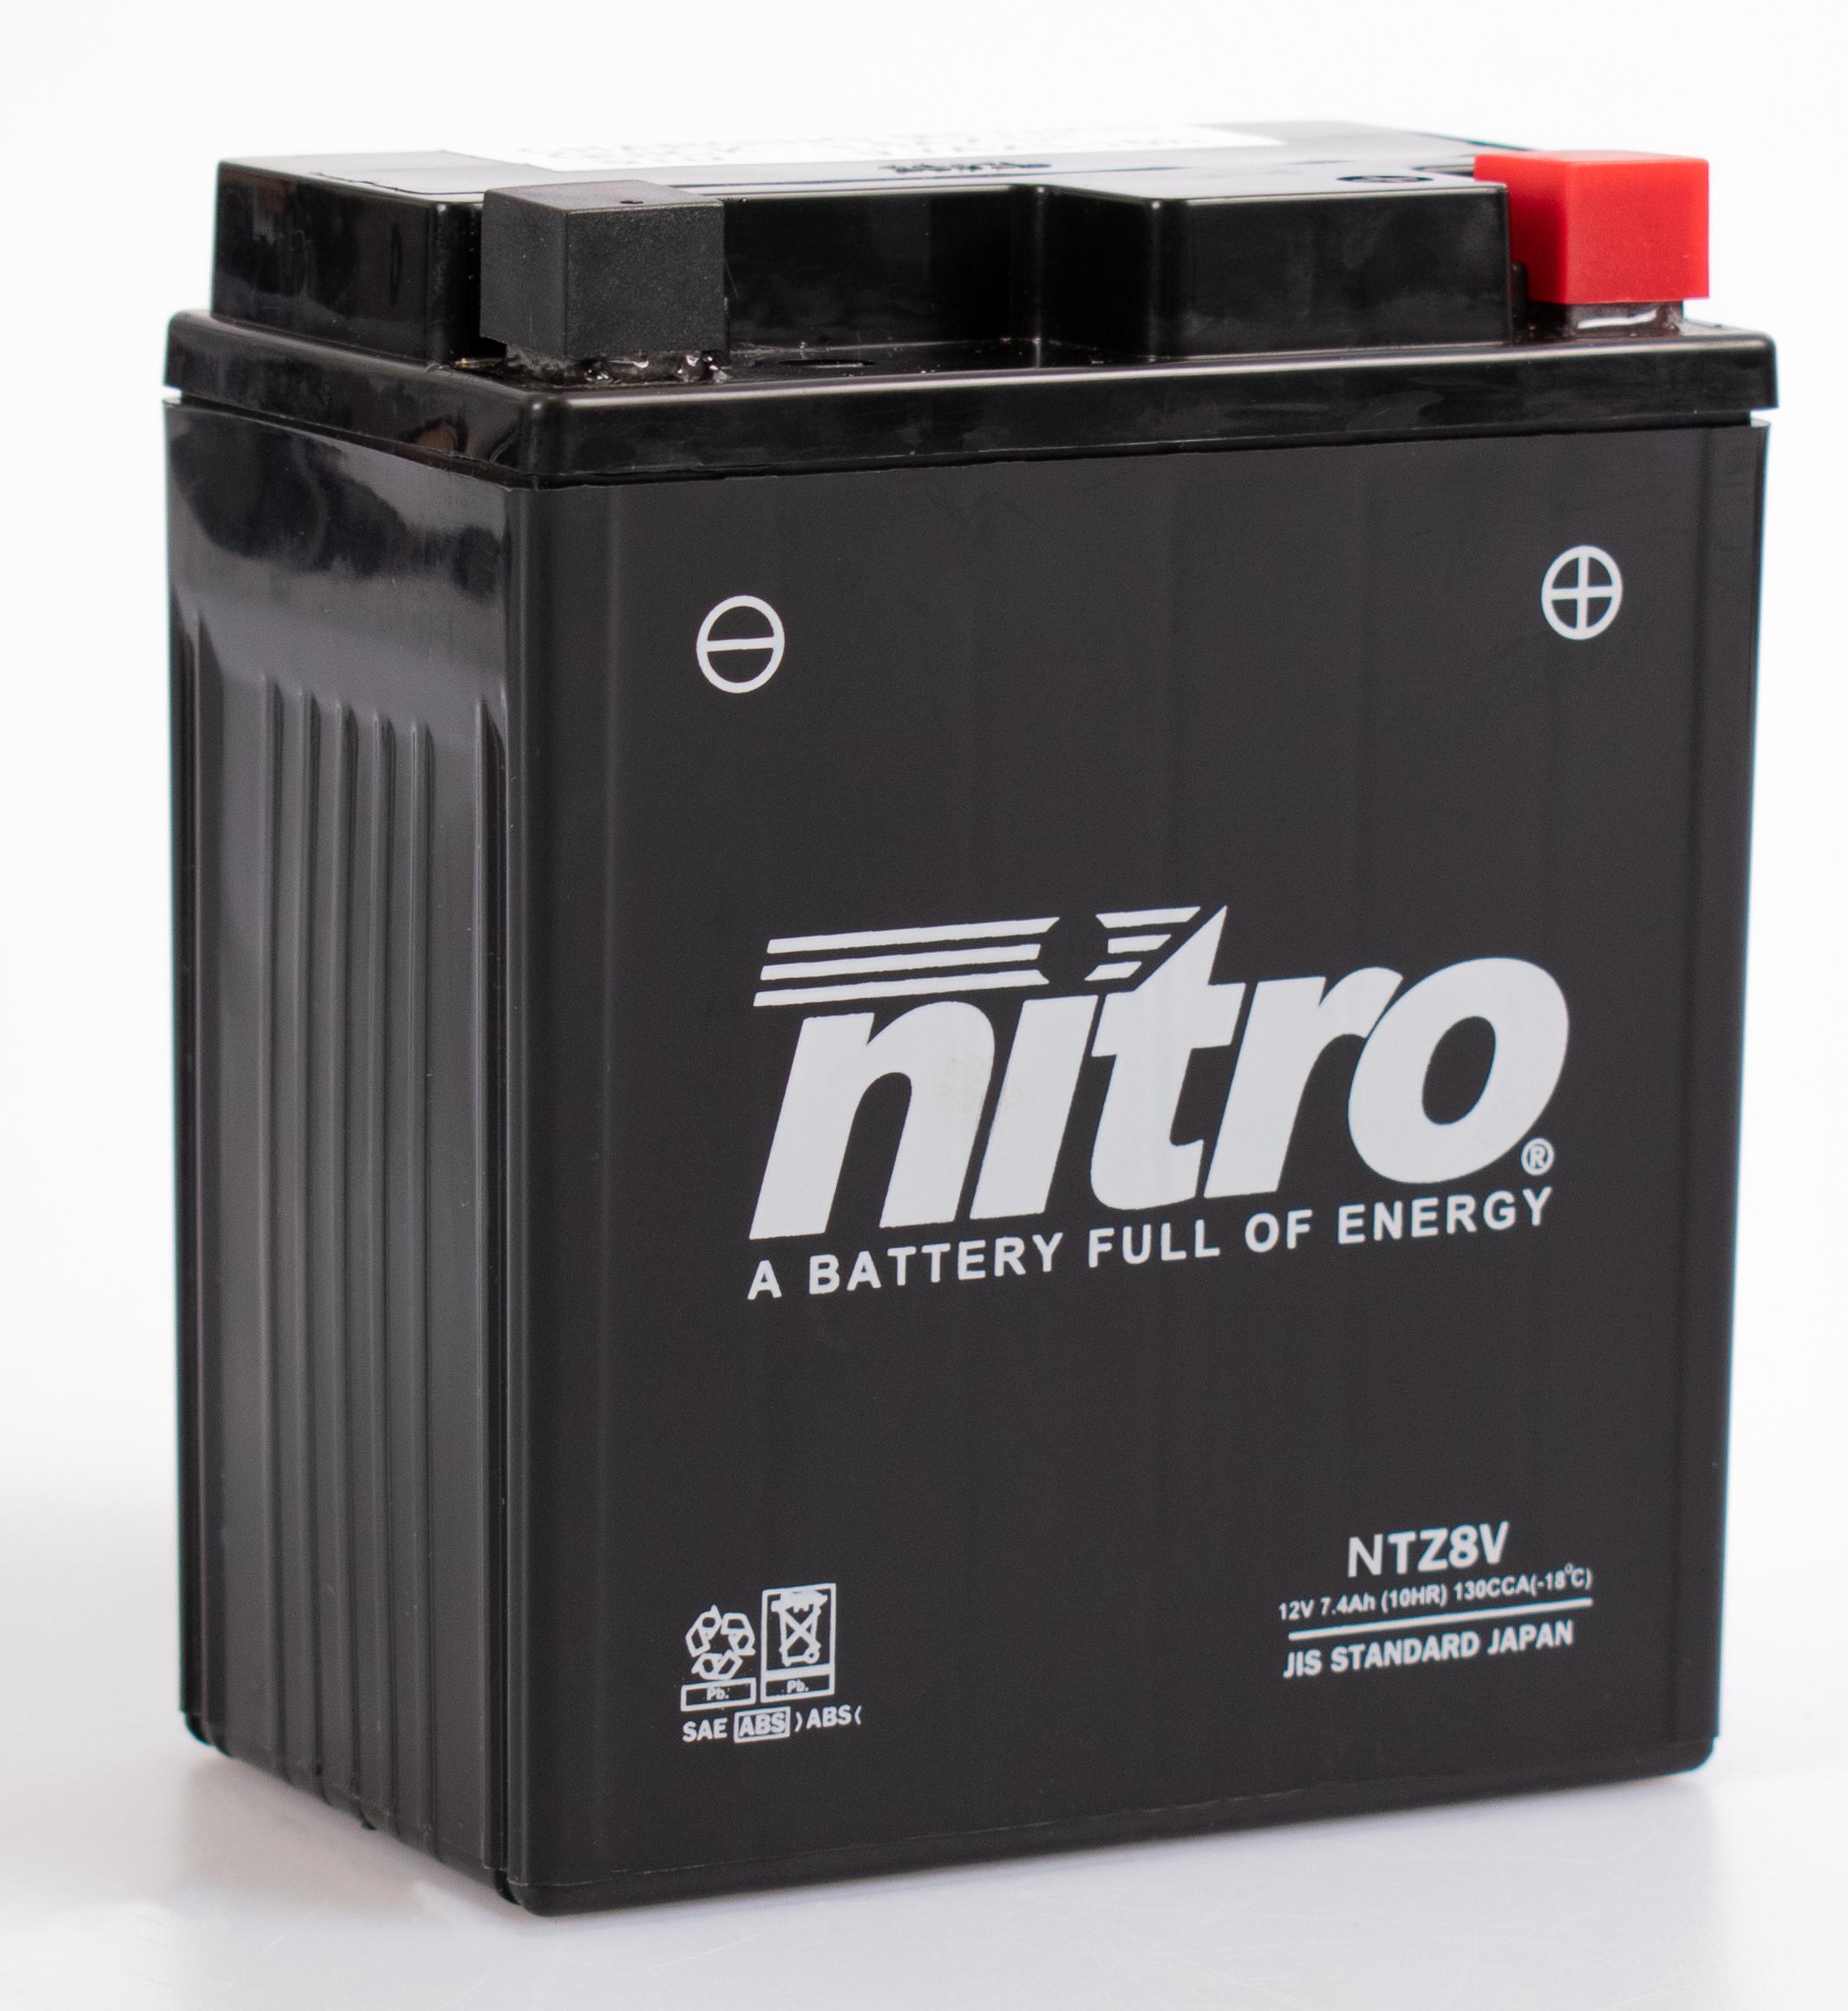 nitro batterie ferm e sans entretien ytz8v rad eu. Black Bedroom Furniture Sets. Home Design Ideas